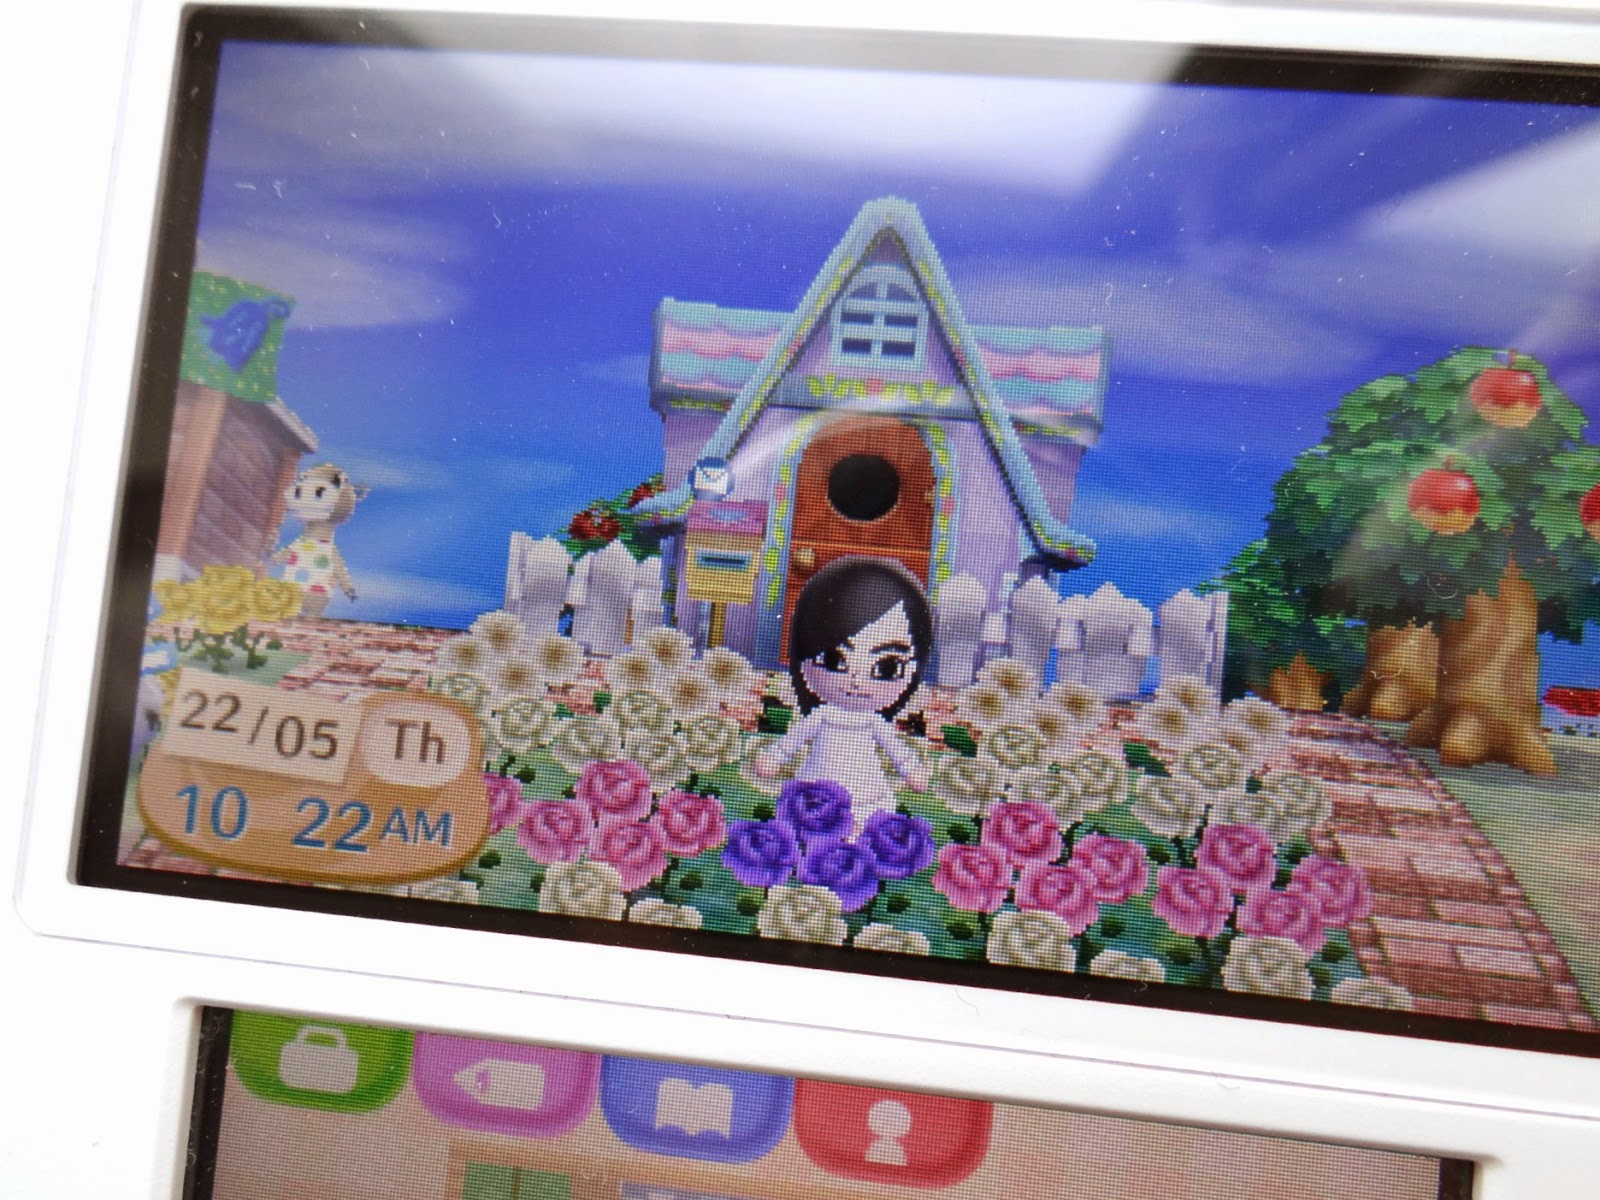 Nintendo, Mii creation, Nintendo Mii characters